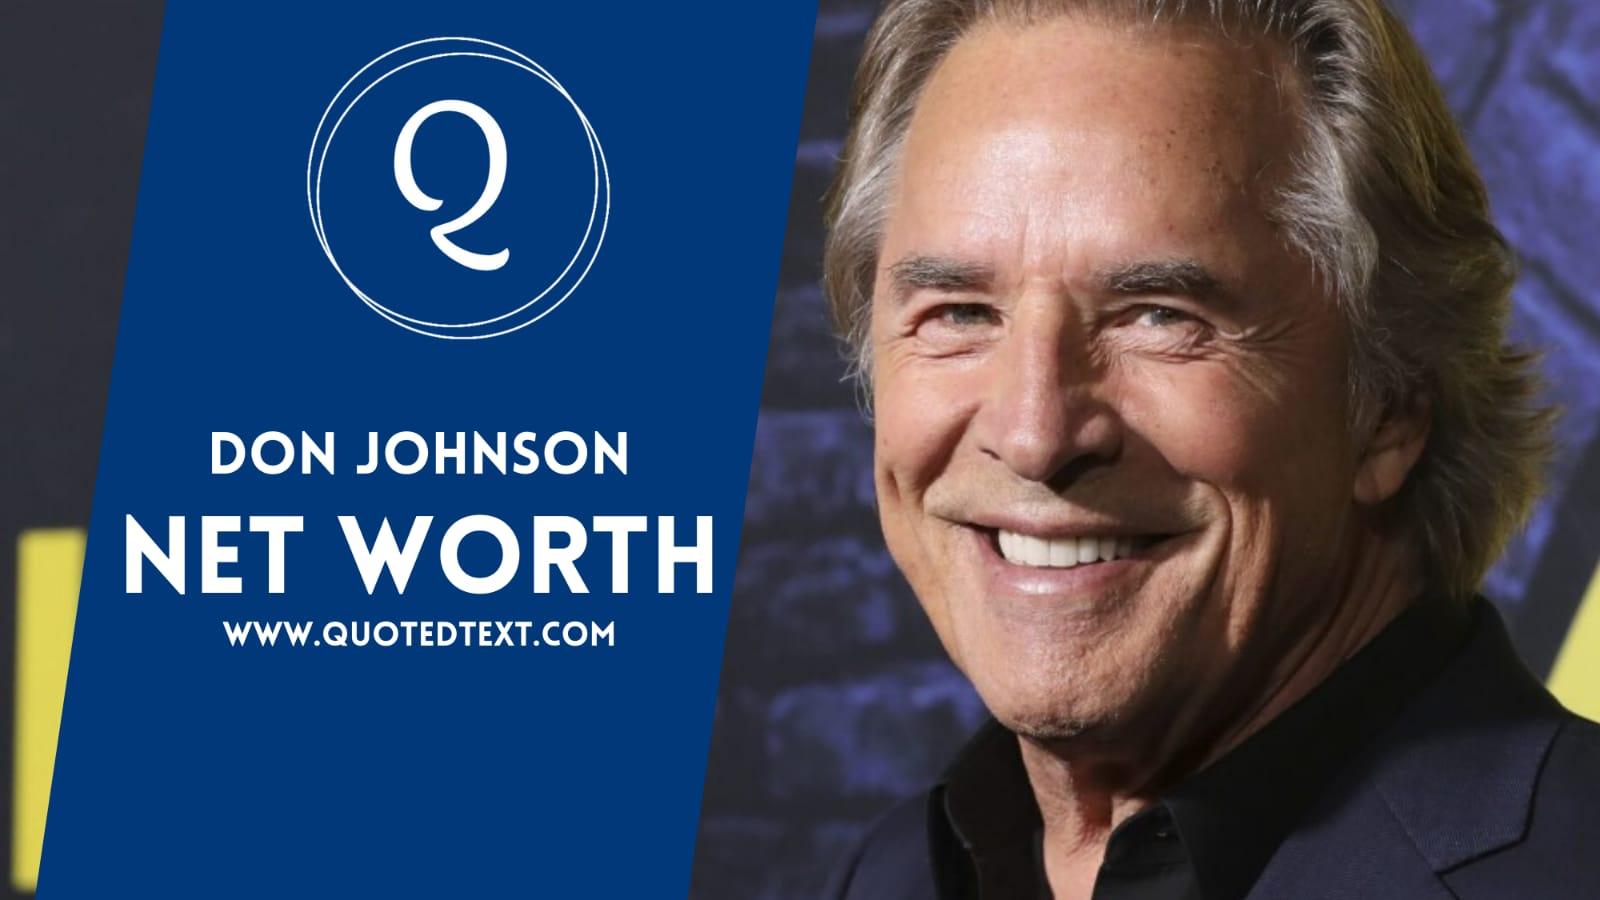 Don Johnson Net Worth